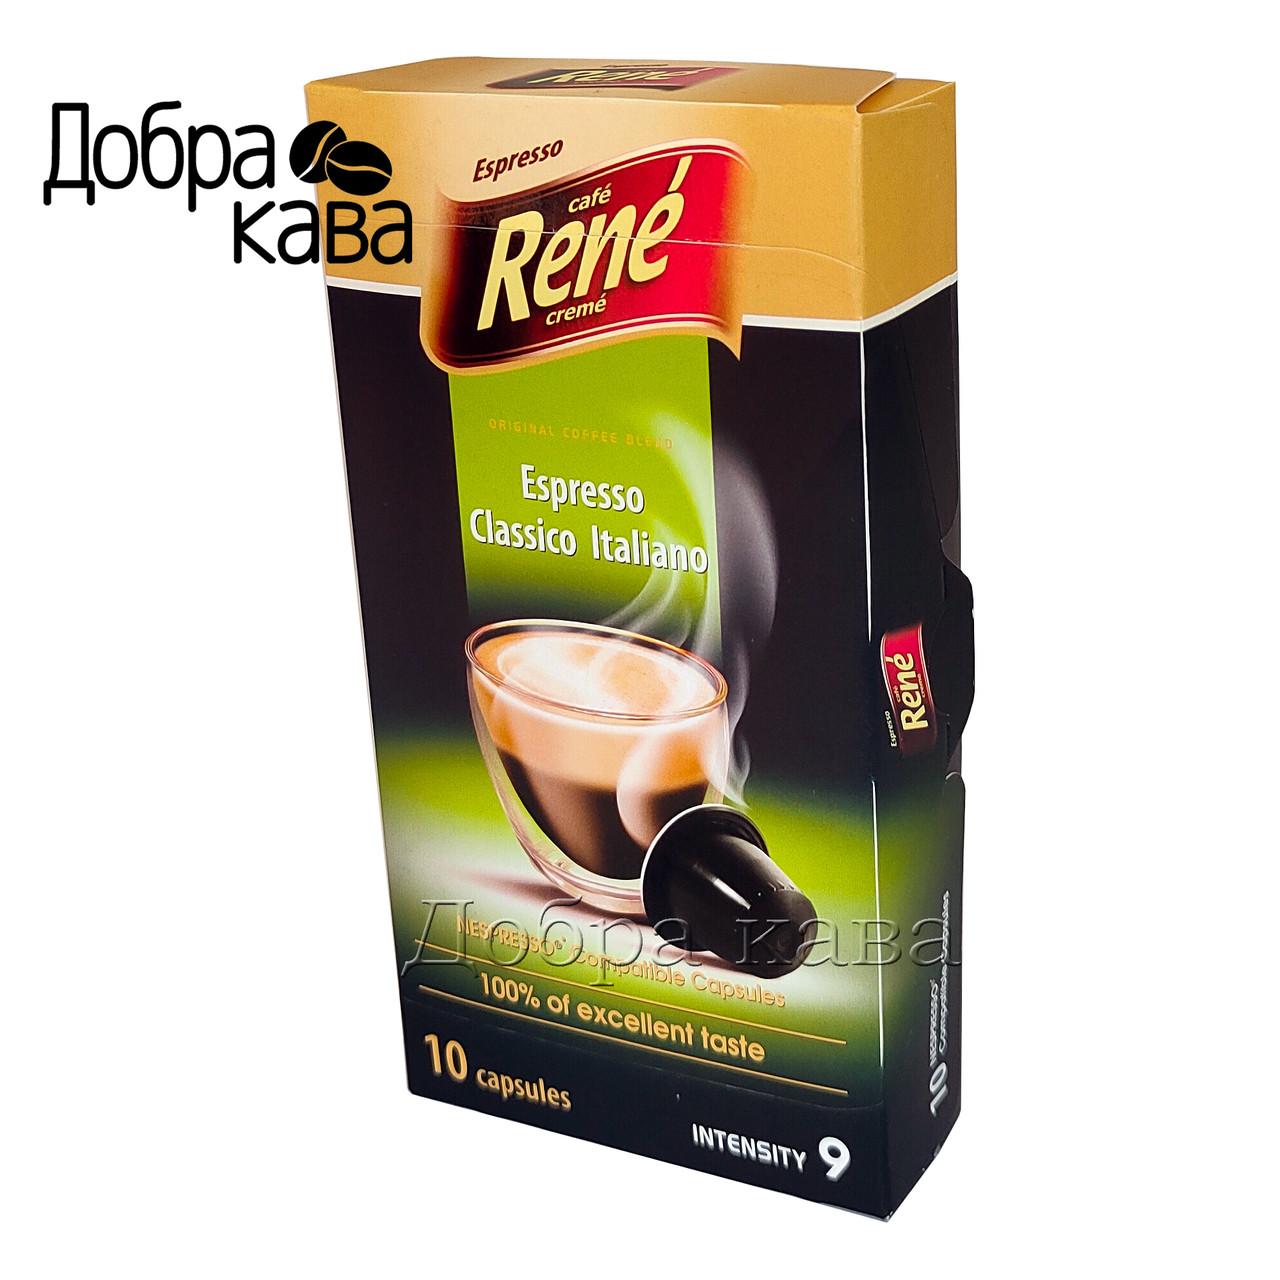 Rene Espresso Classico Italiano кави в капсулах для Nespresso 10шт